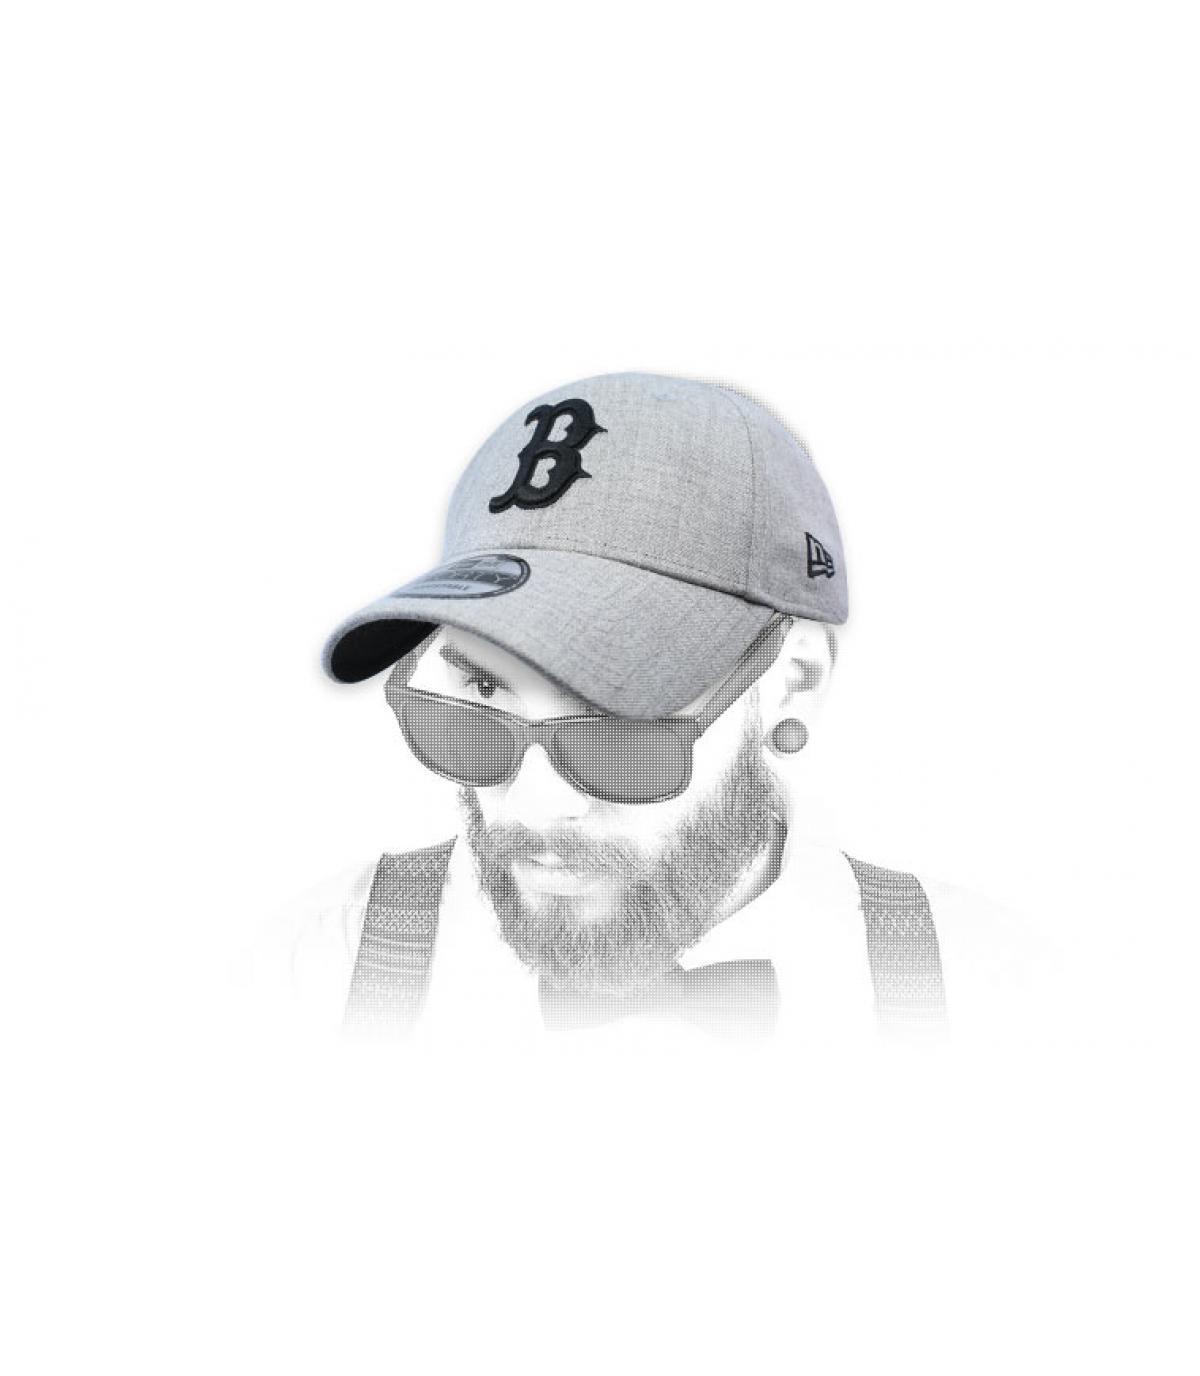 gorra B gris negro